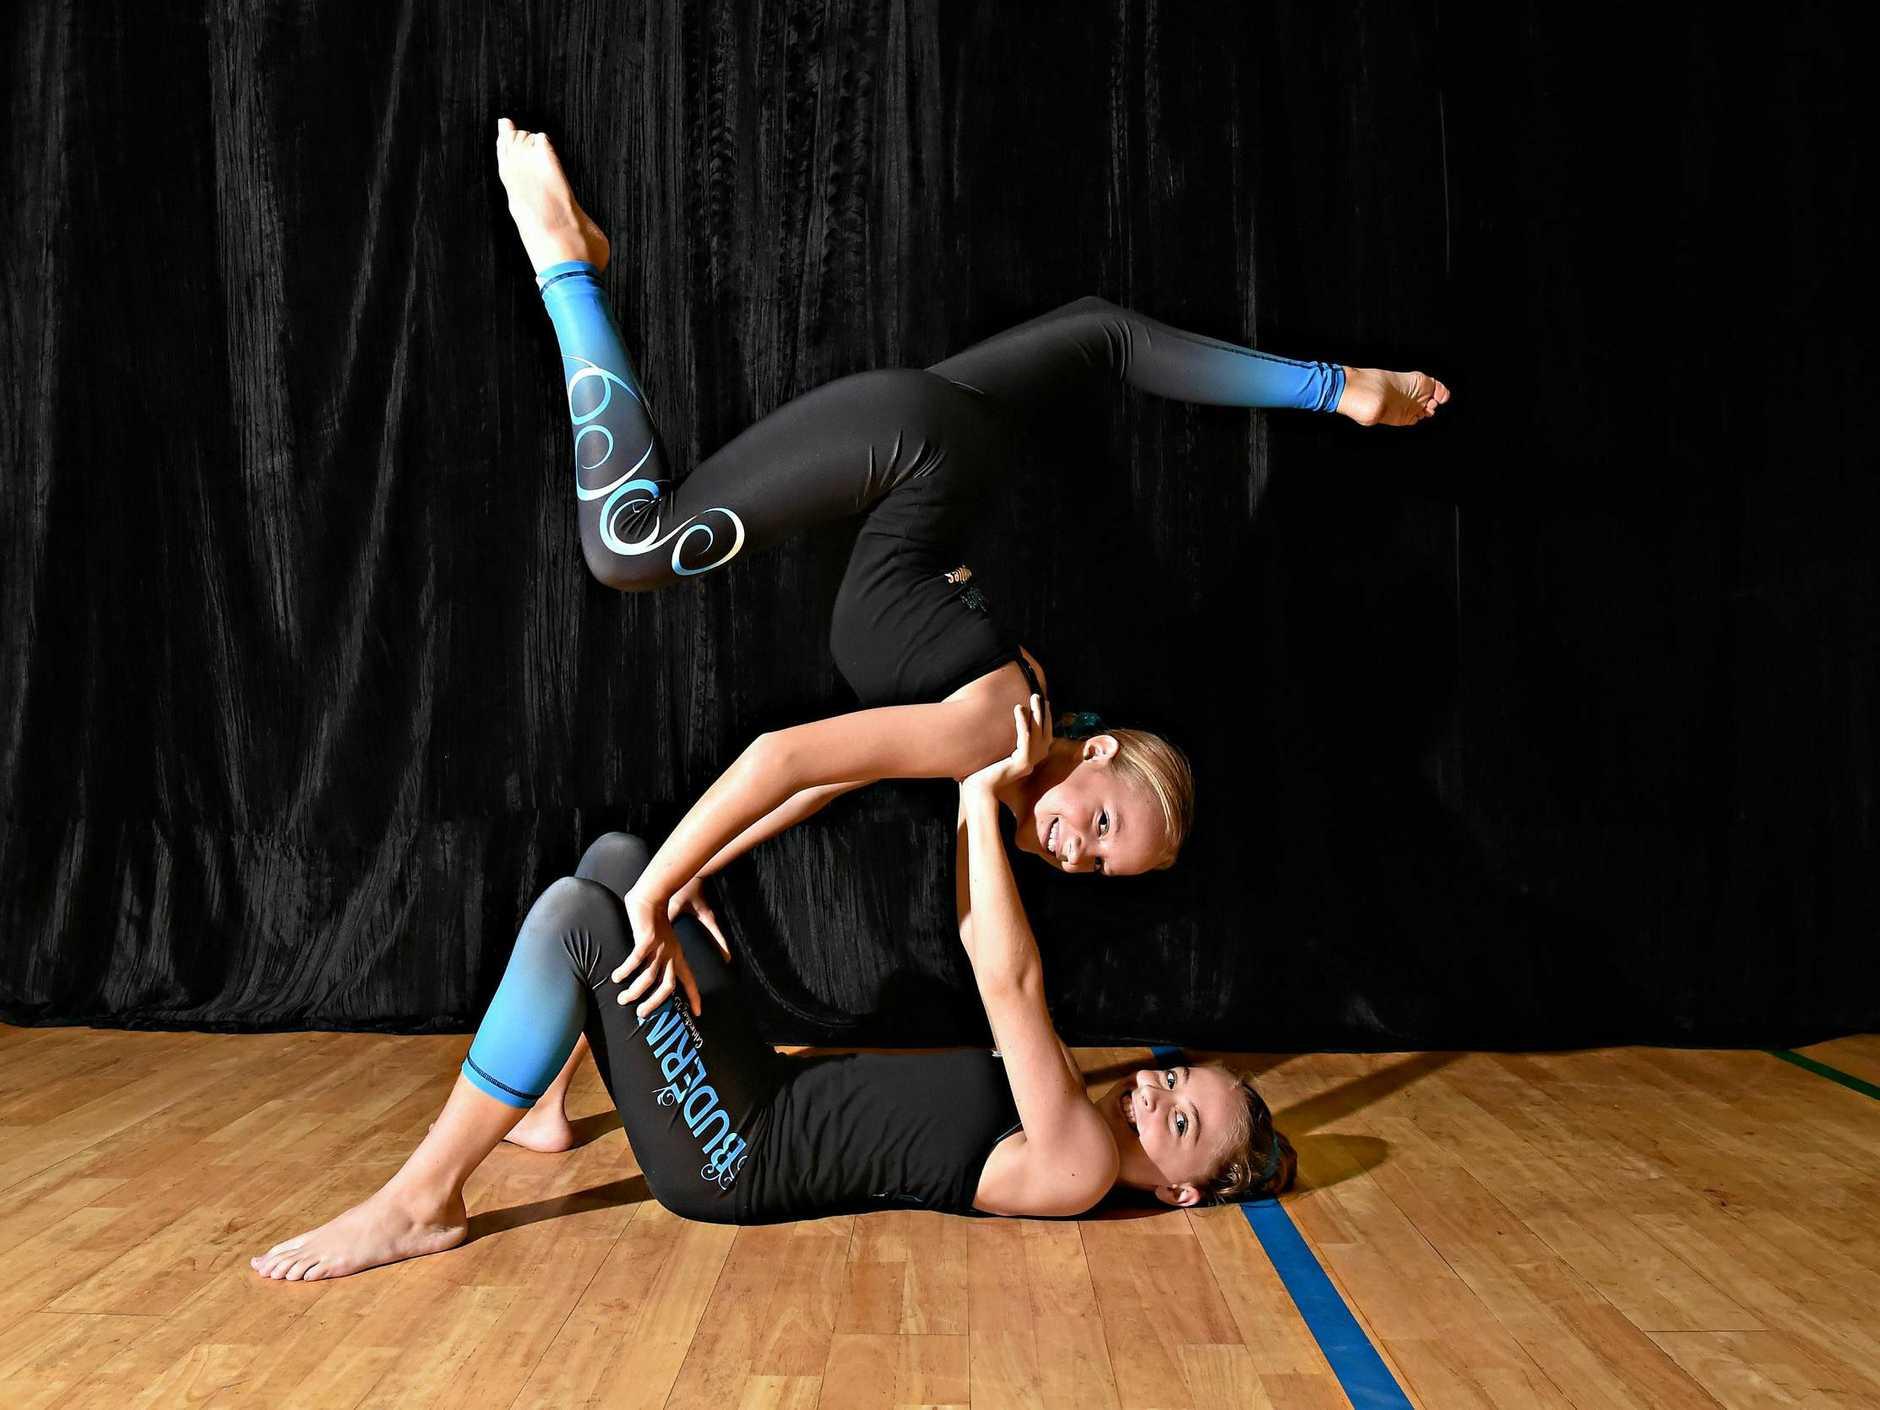 ON TOP: Tilda Pirest and Sierra Andrews show off their skills at a Calisthenics Buderim class.